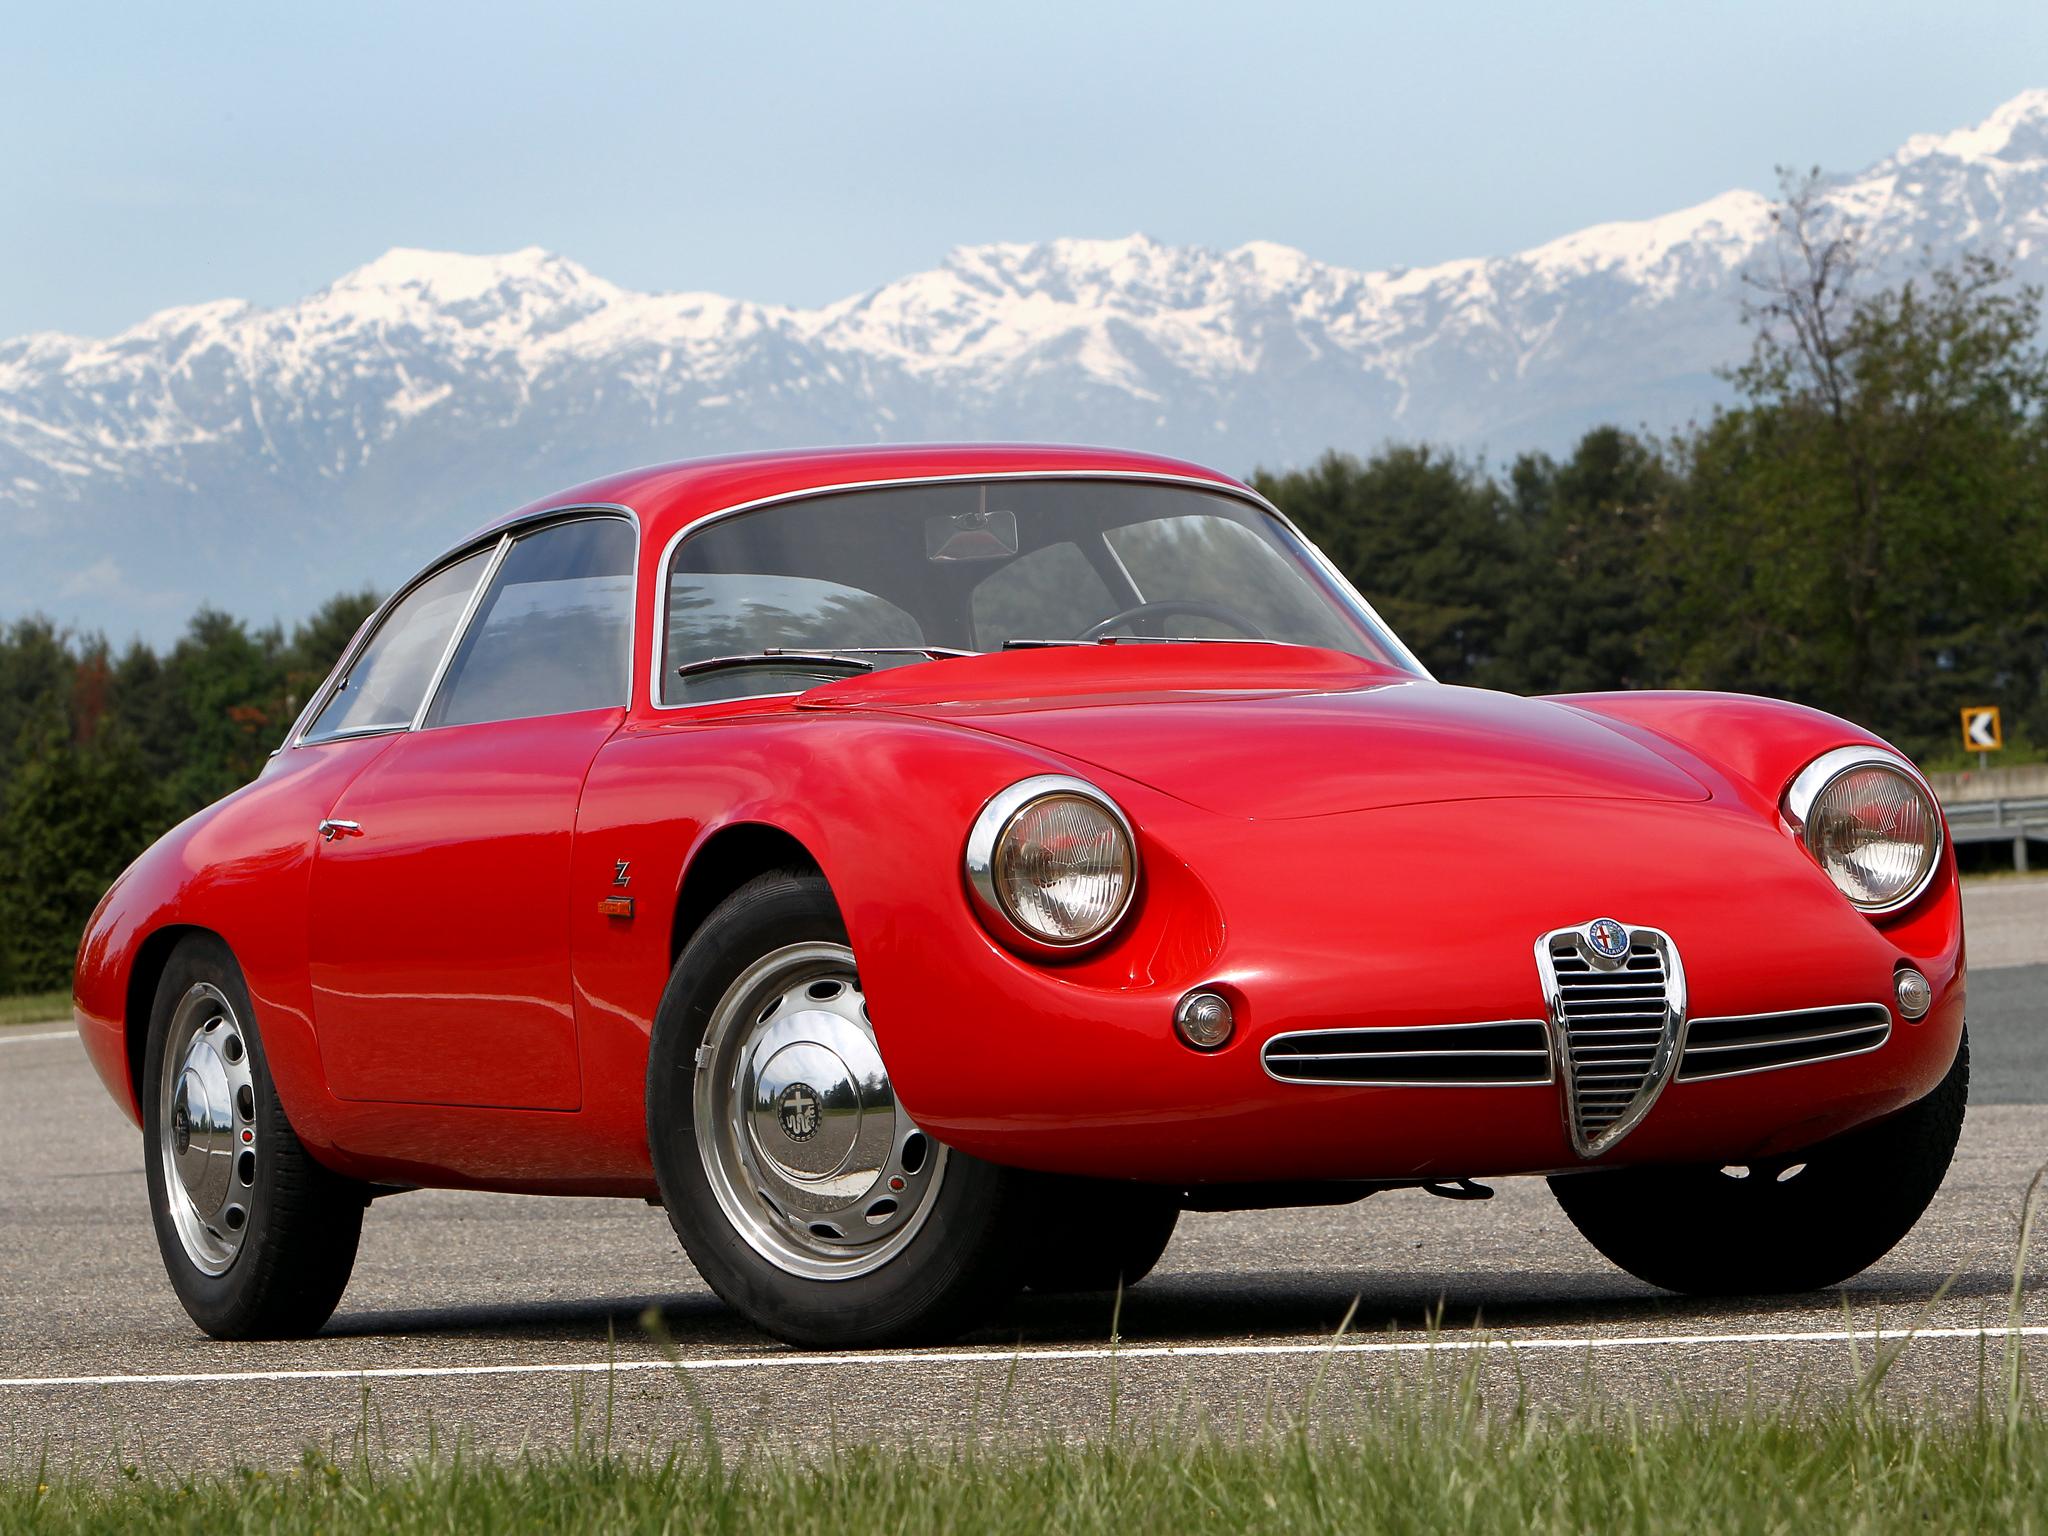 Alfa romeo giulietta 2013 models 13